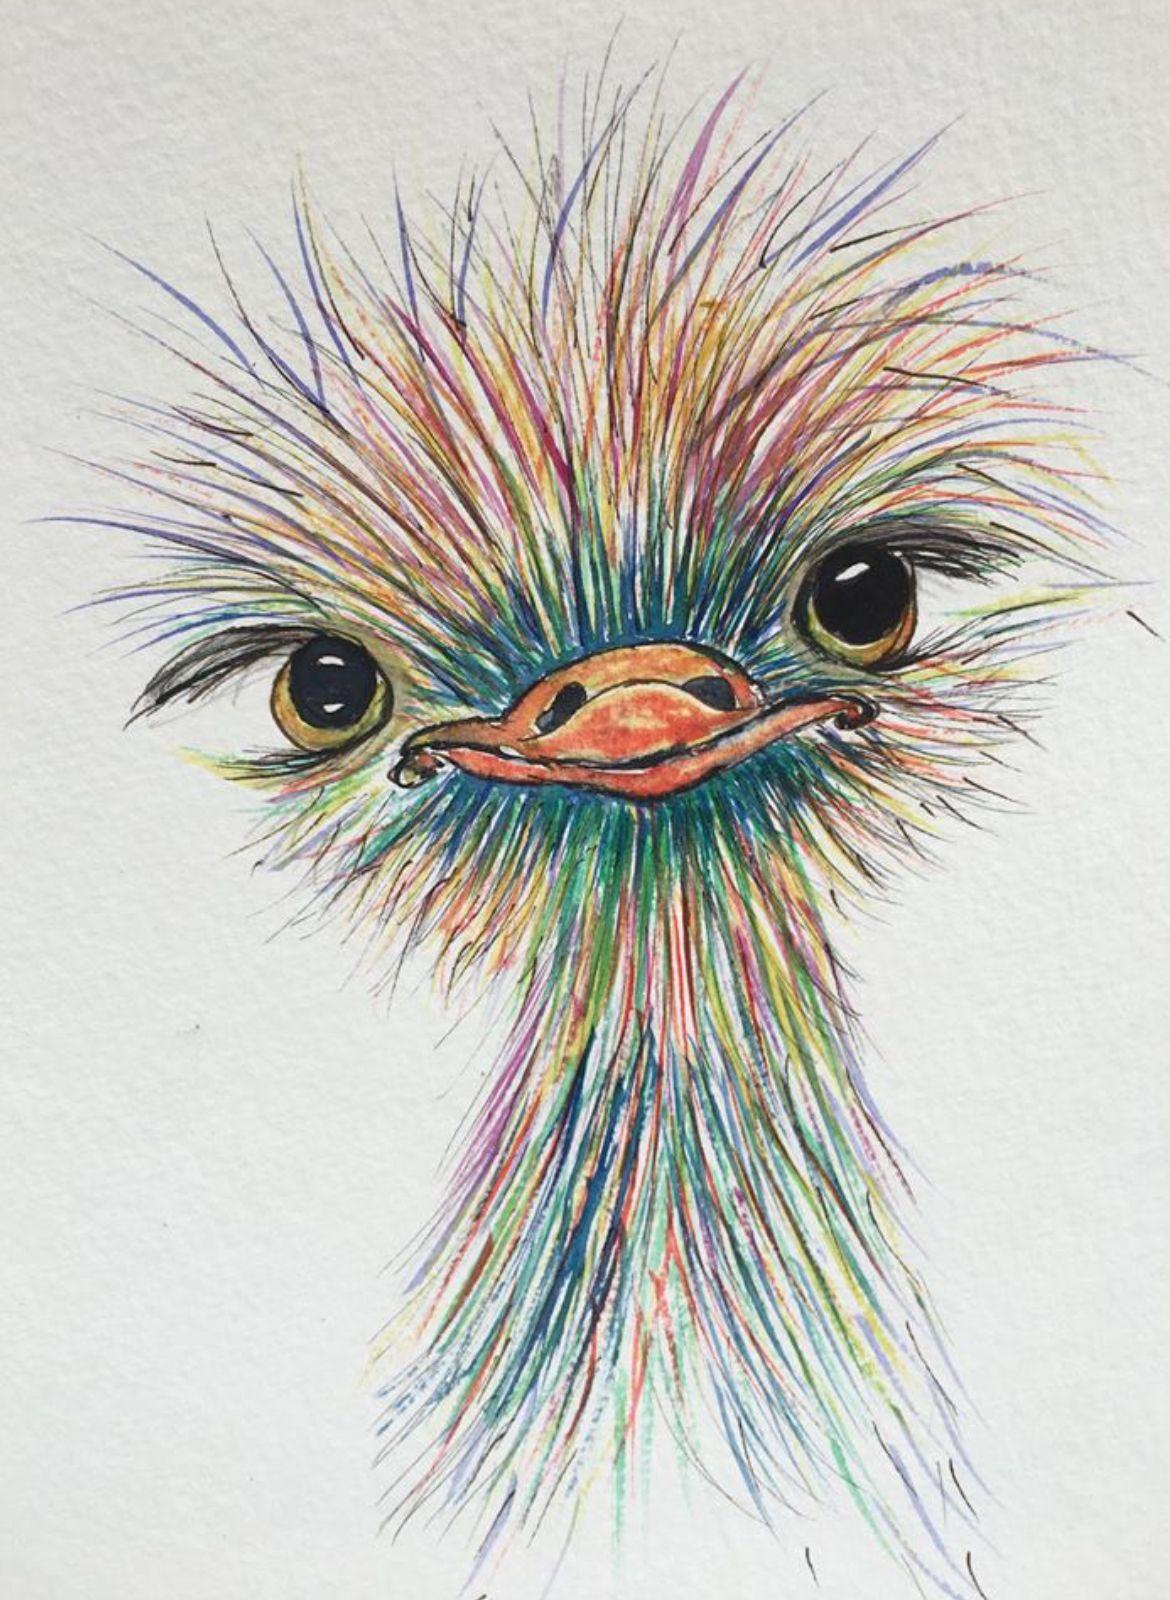 Ostrich librarian w/ glasses